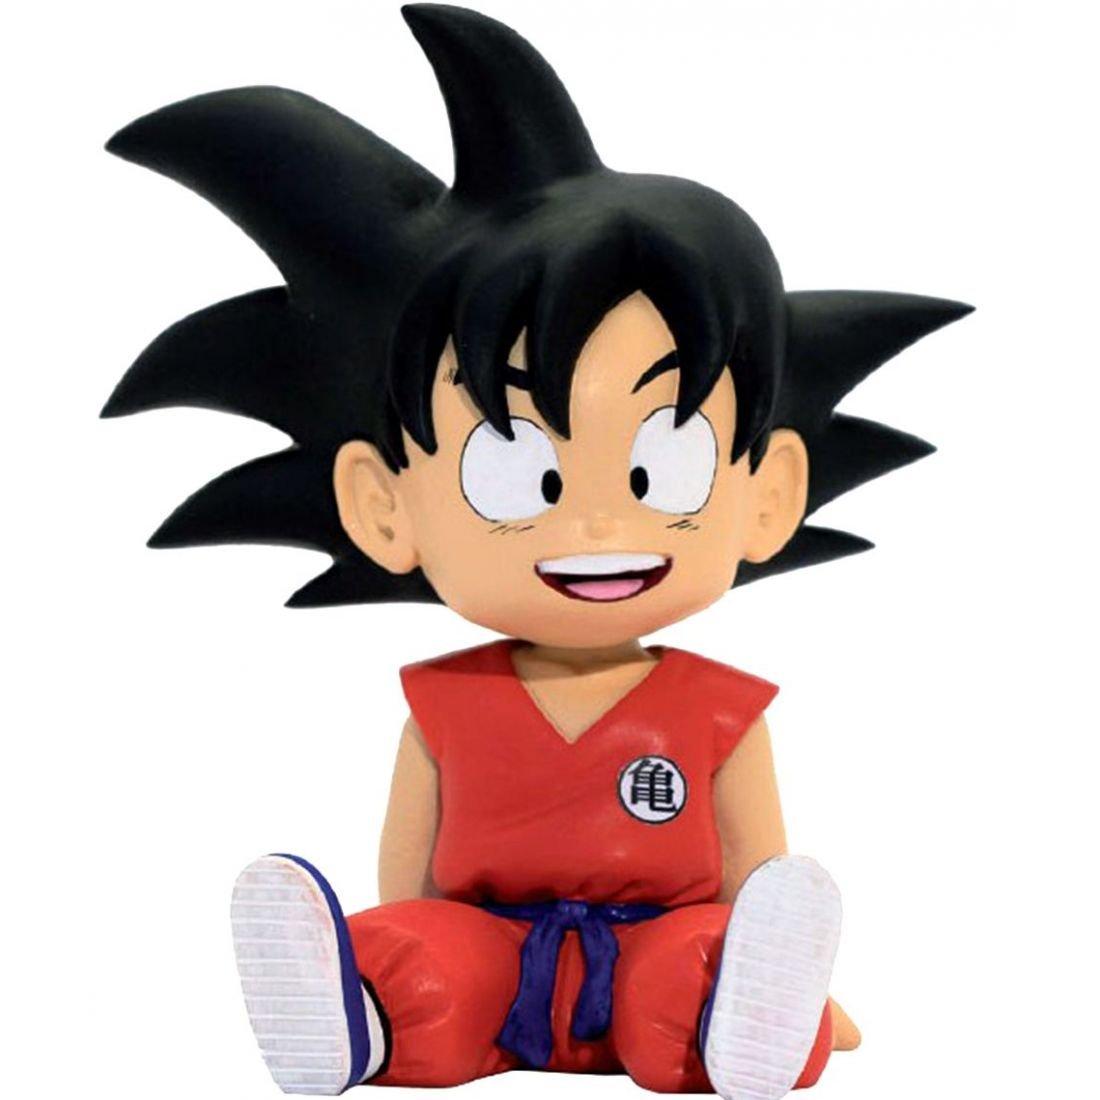 Dragonpro 599386031 - Hucha Dragon Ball - Goku Sentado (13,5cm) 80062